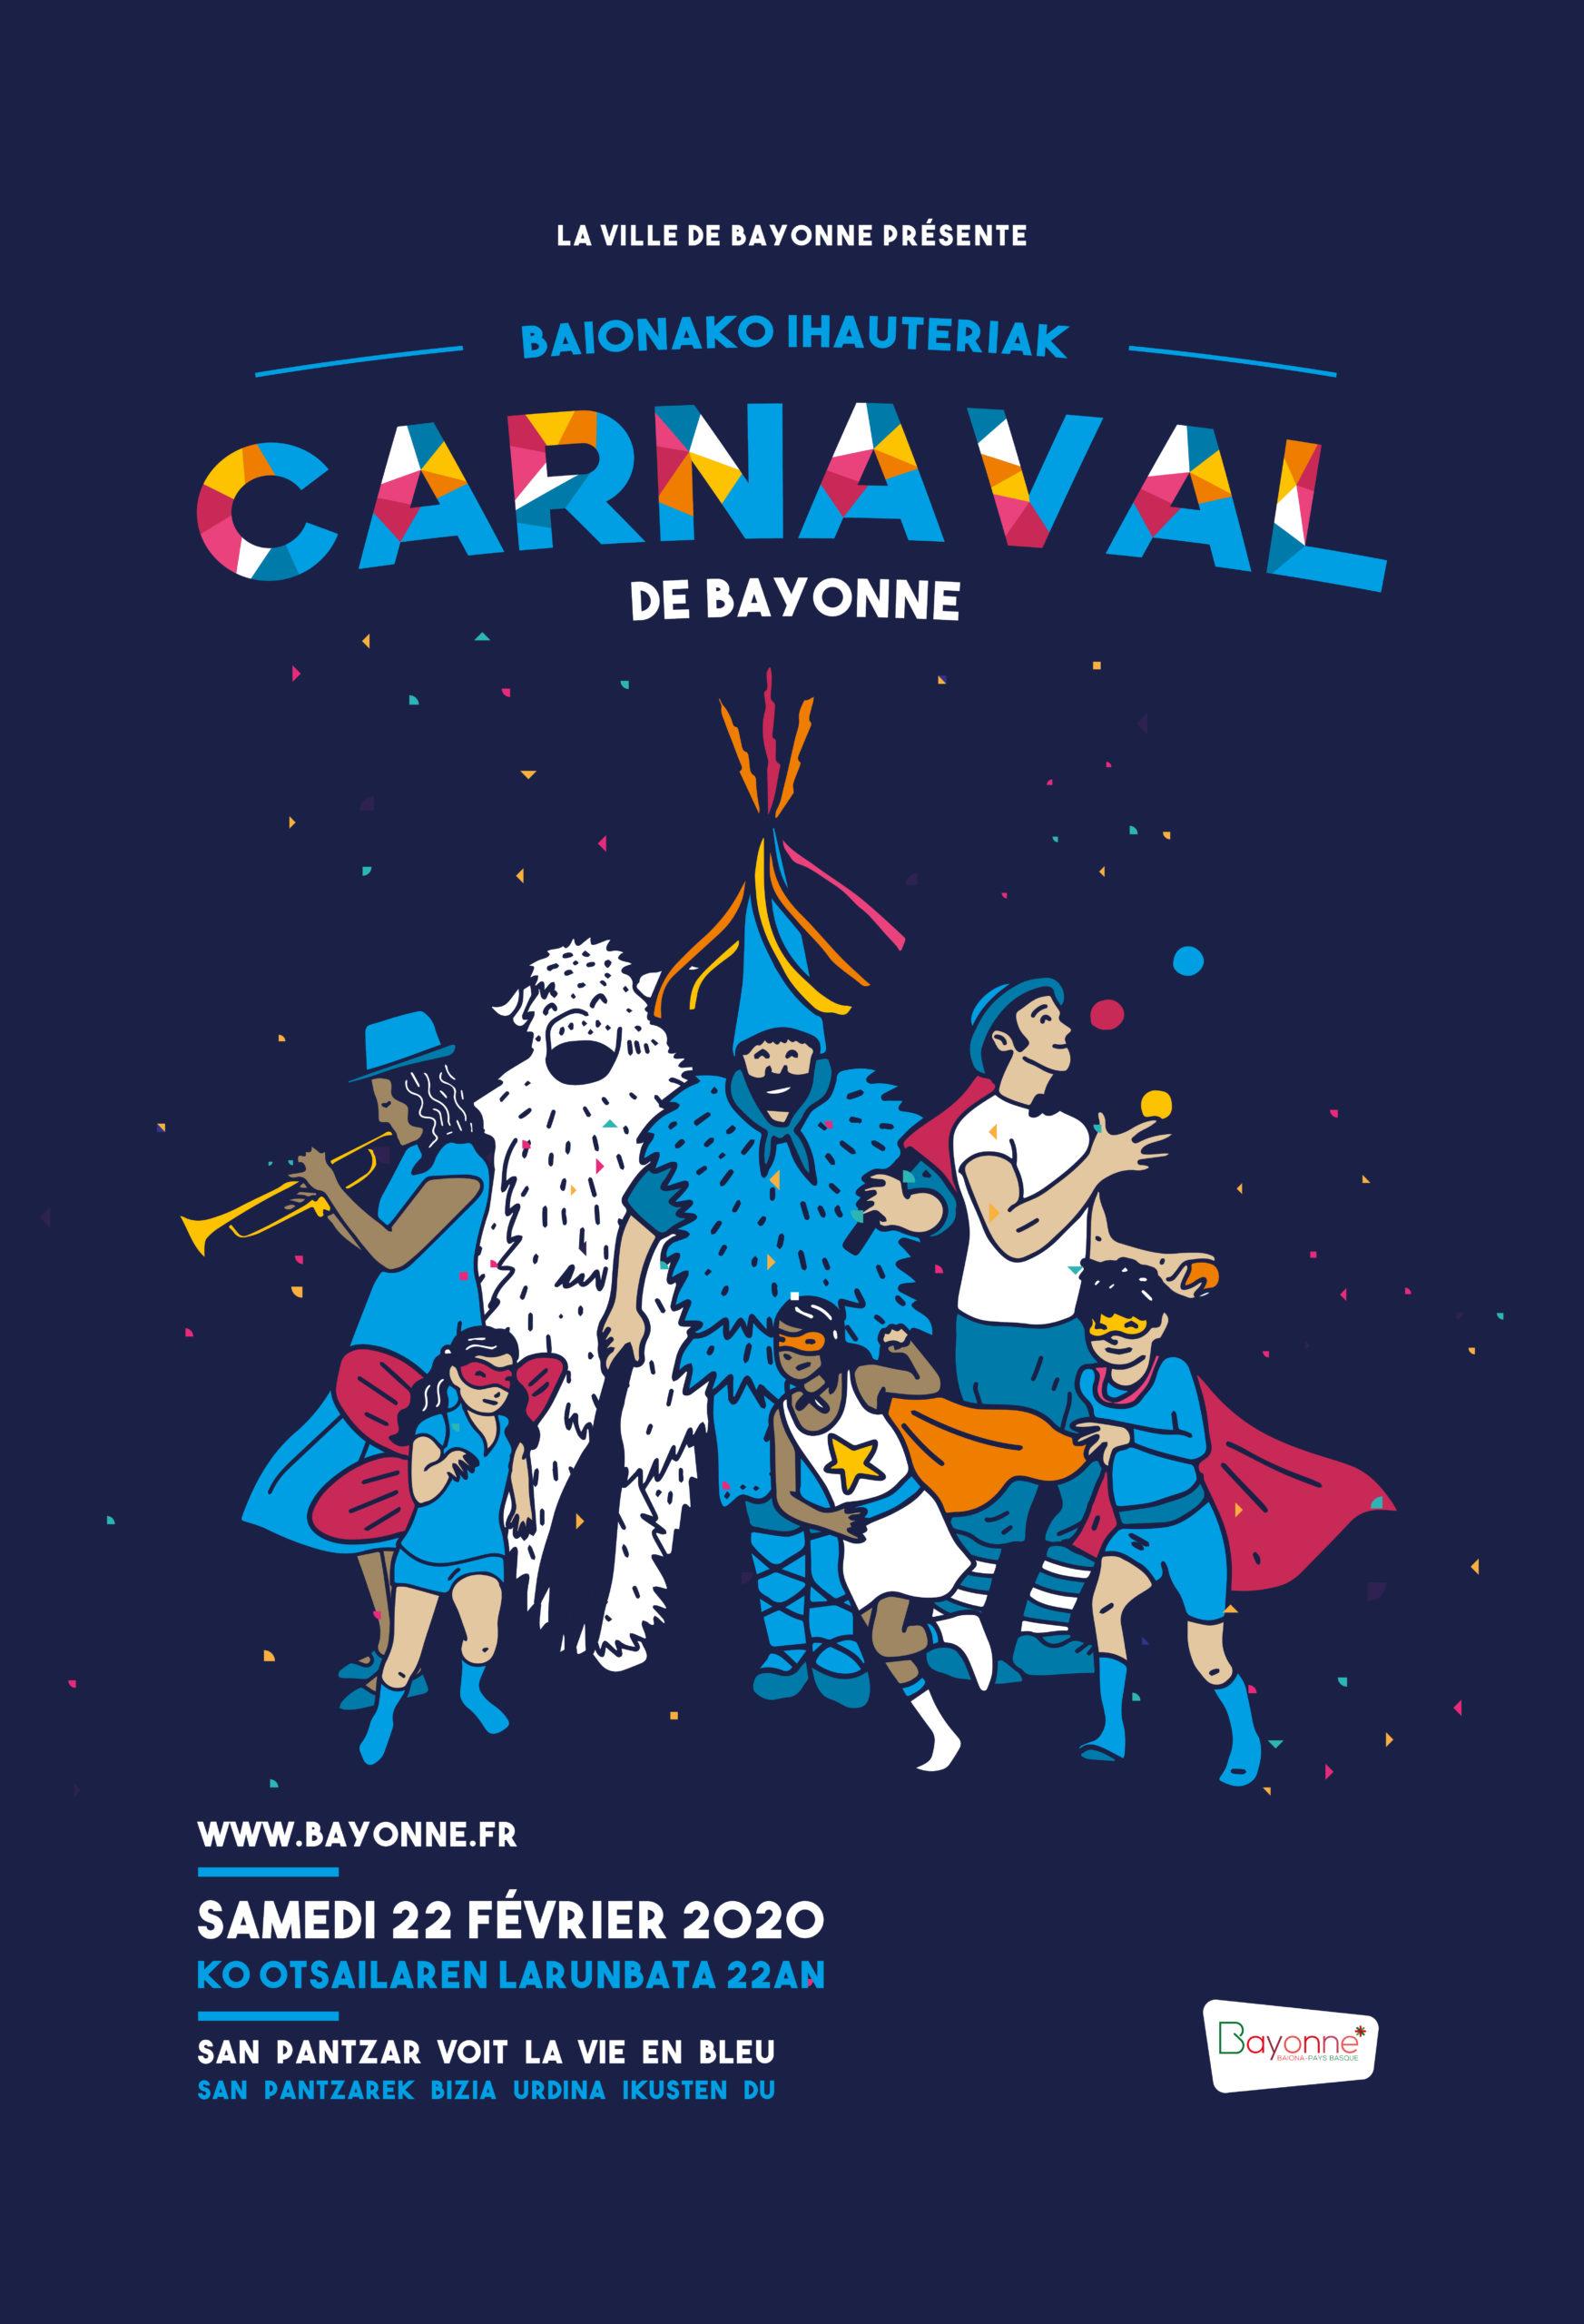 Carnaval de Bayonne affiche principale